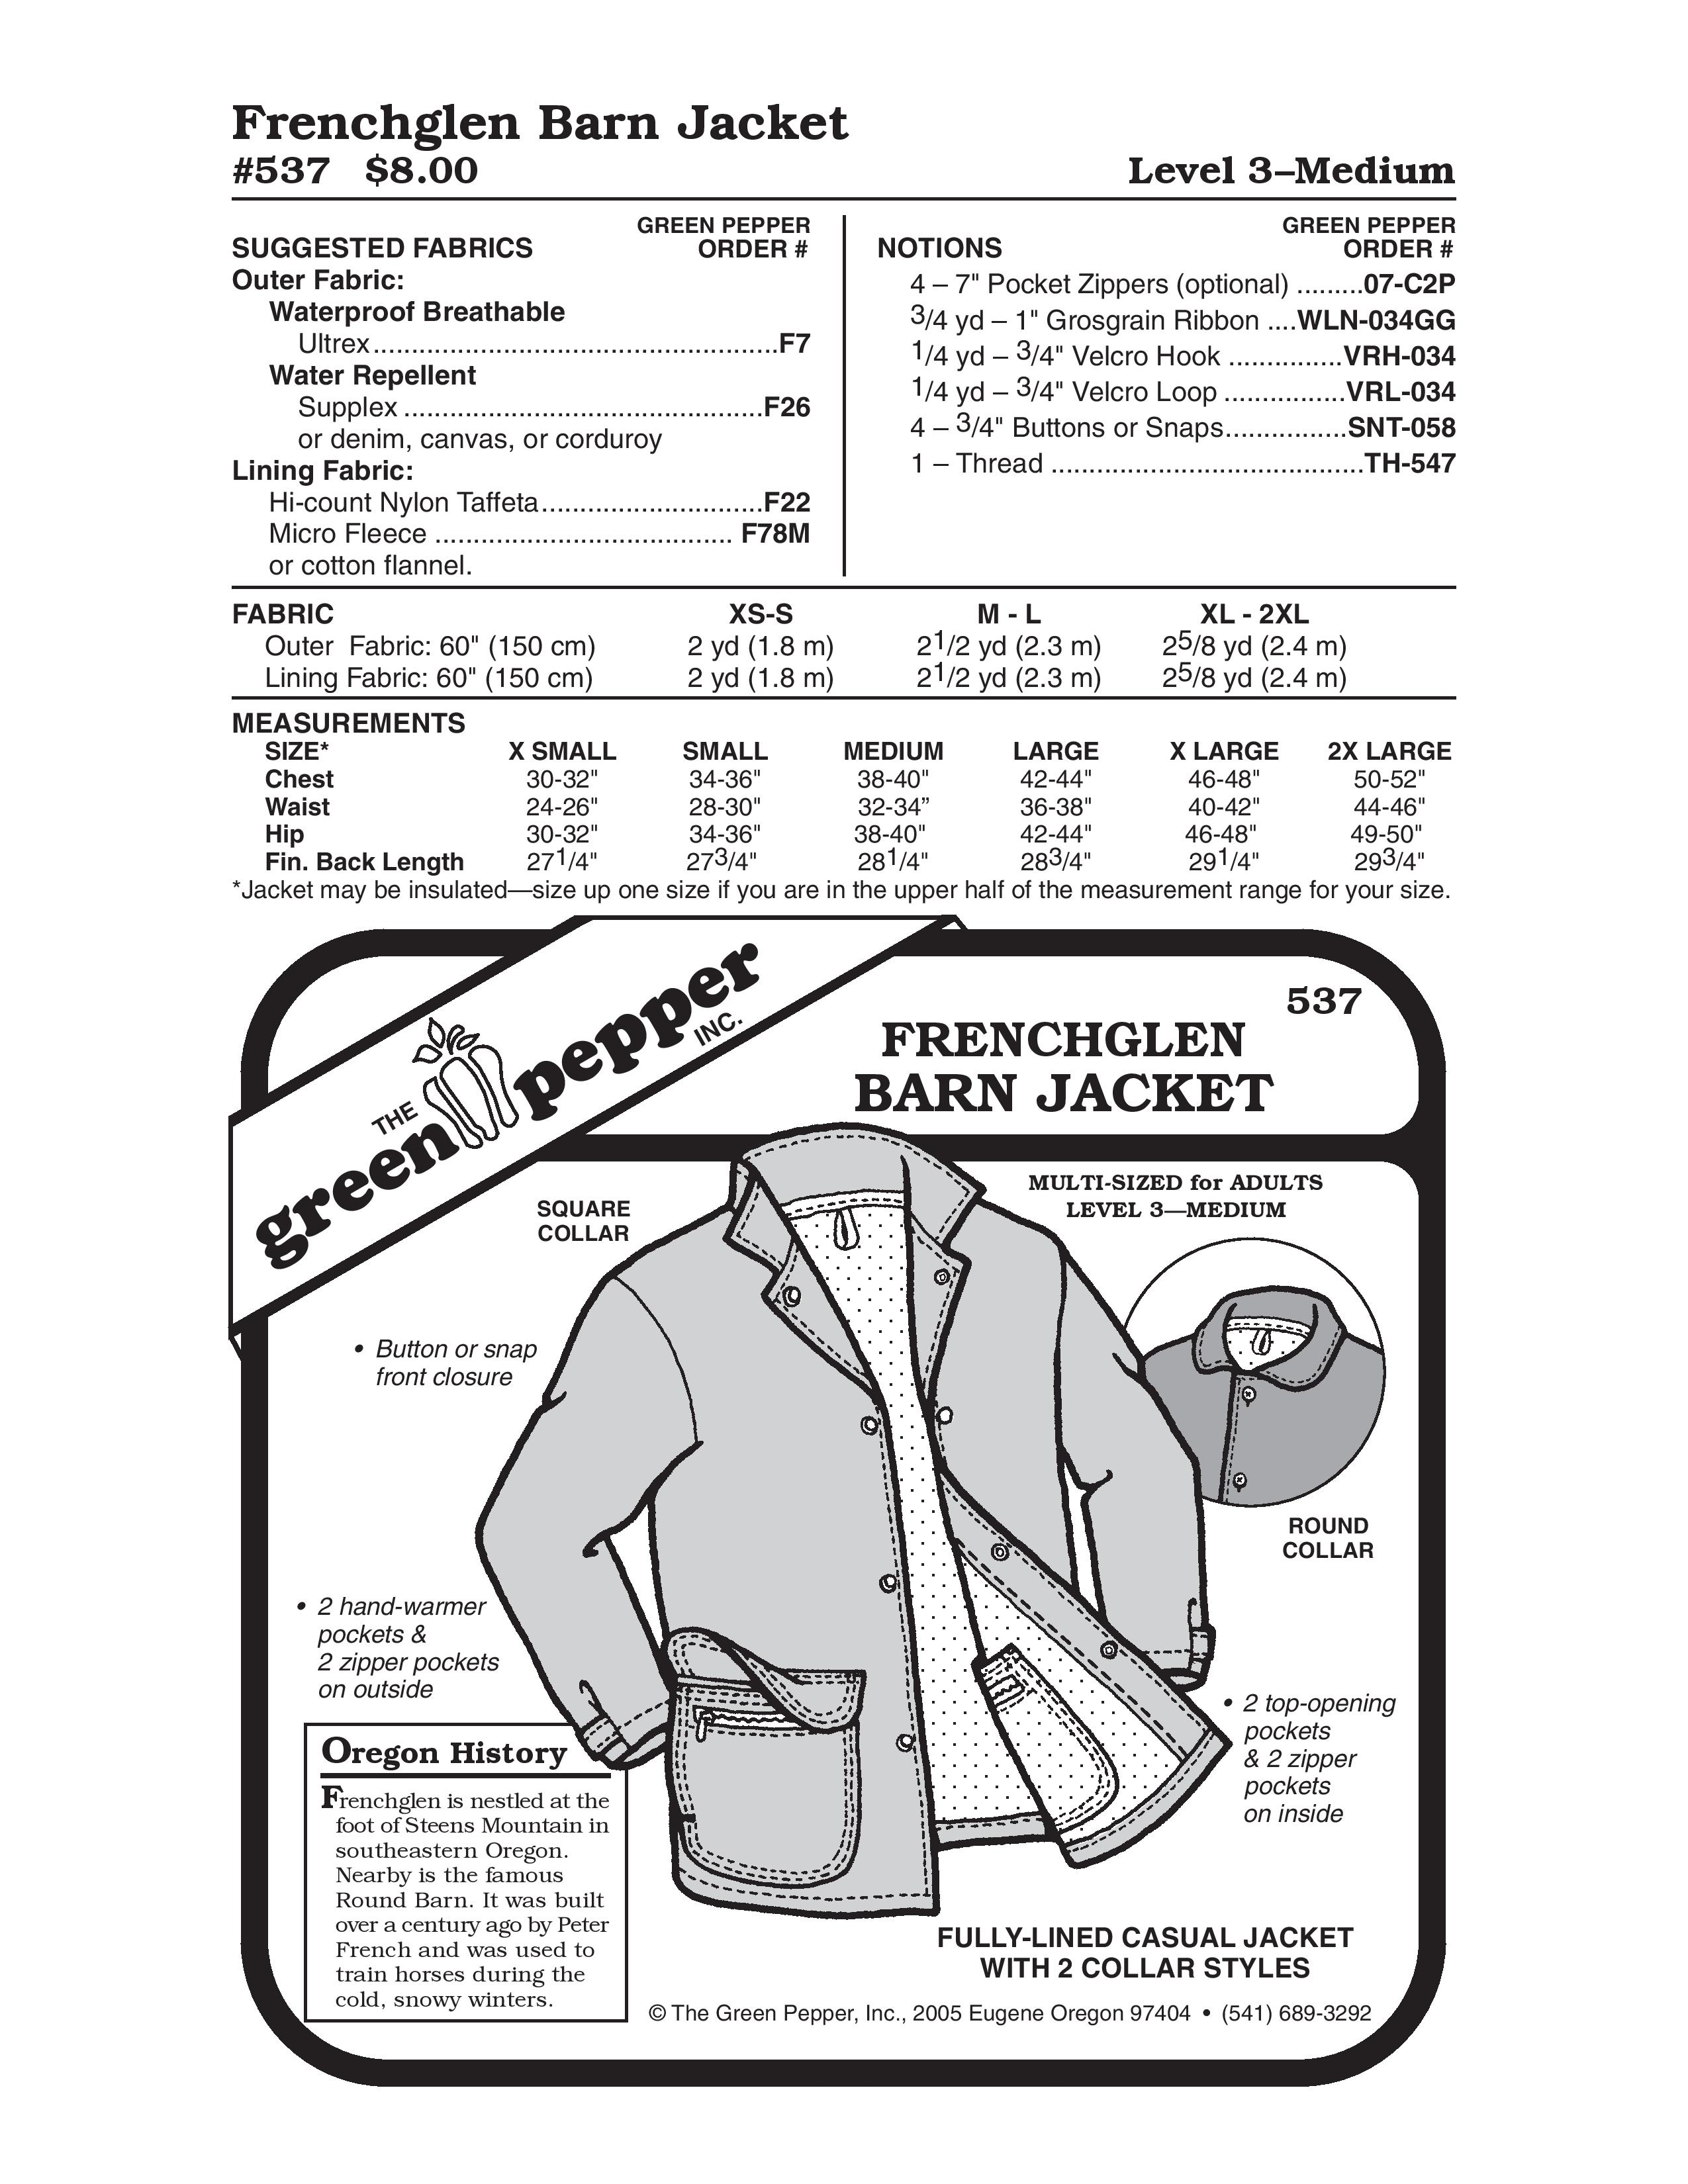 Frenchglen Barn Jacket Sewing Pattern